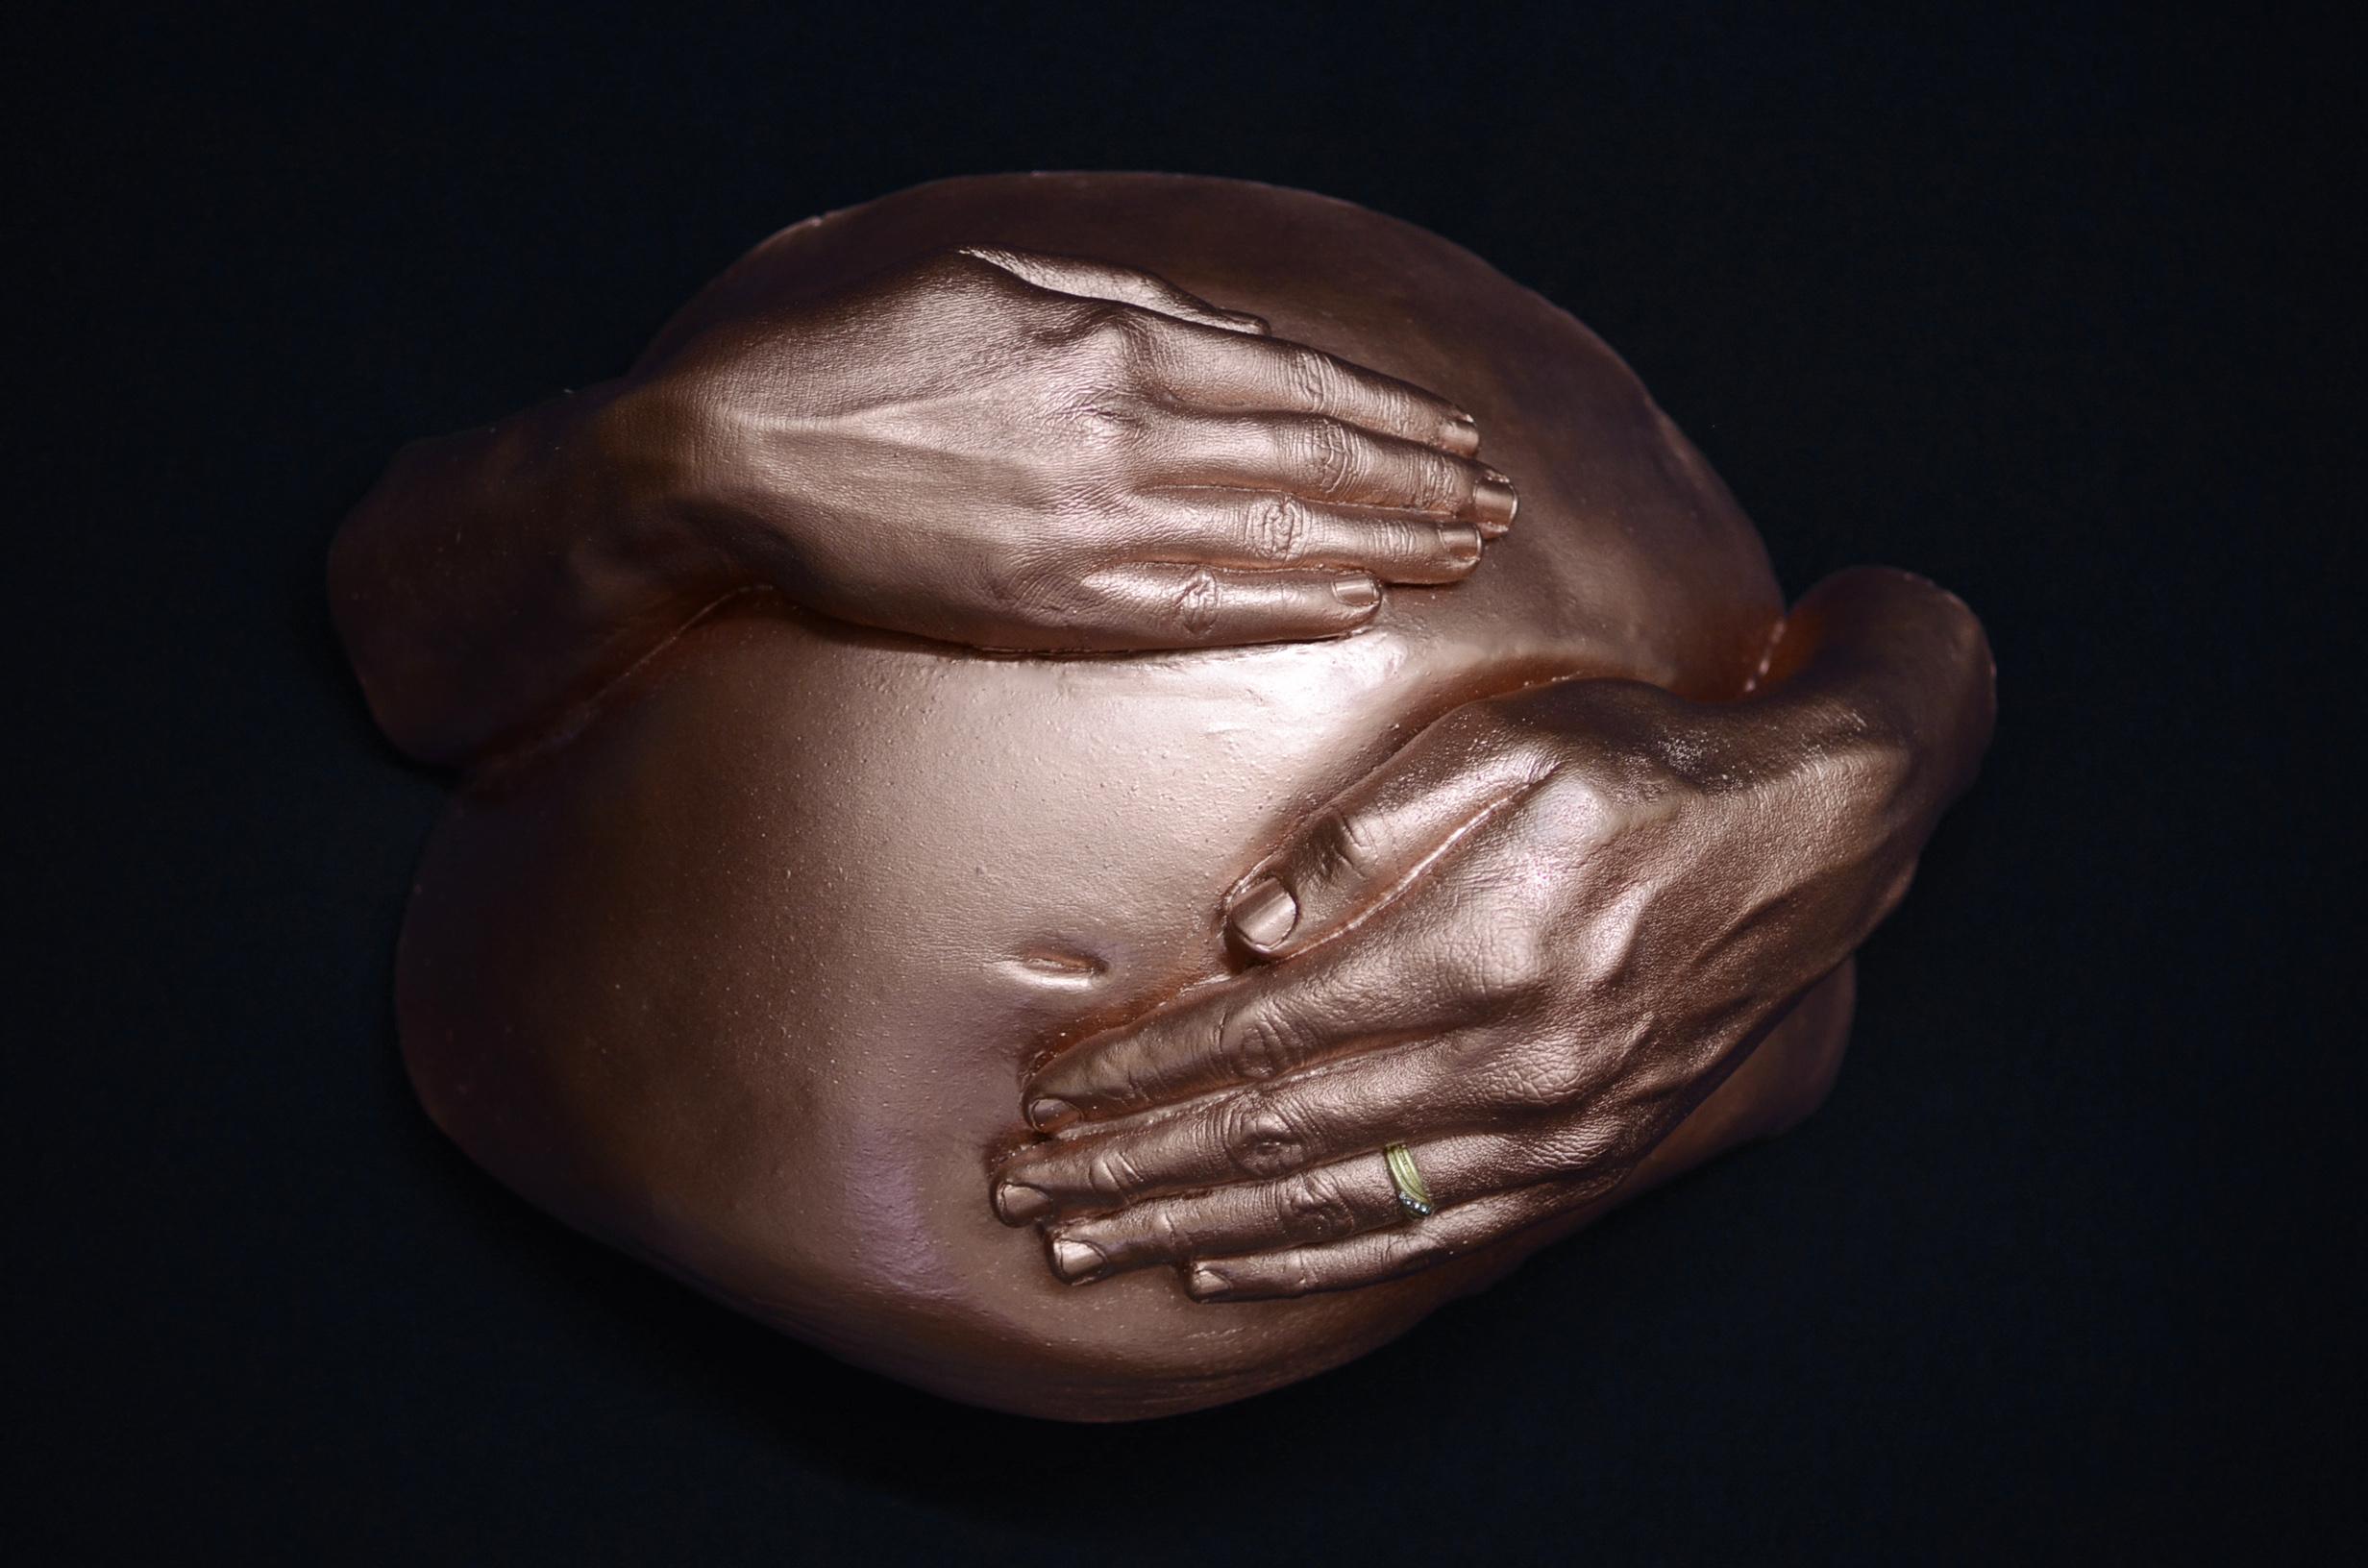 Tummy with mom & dad hand